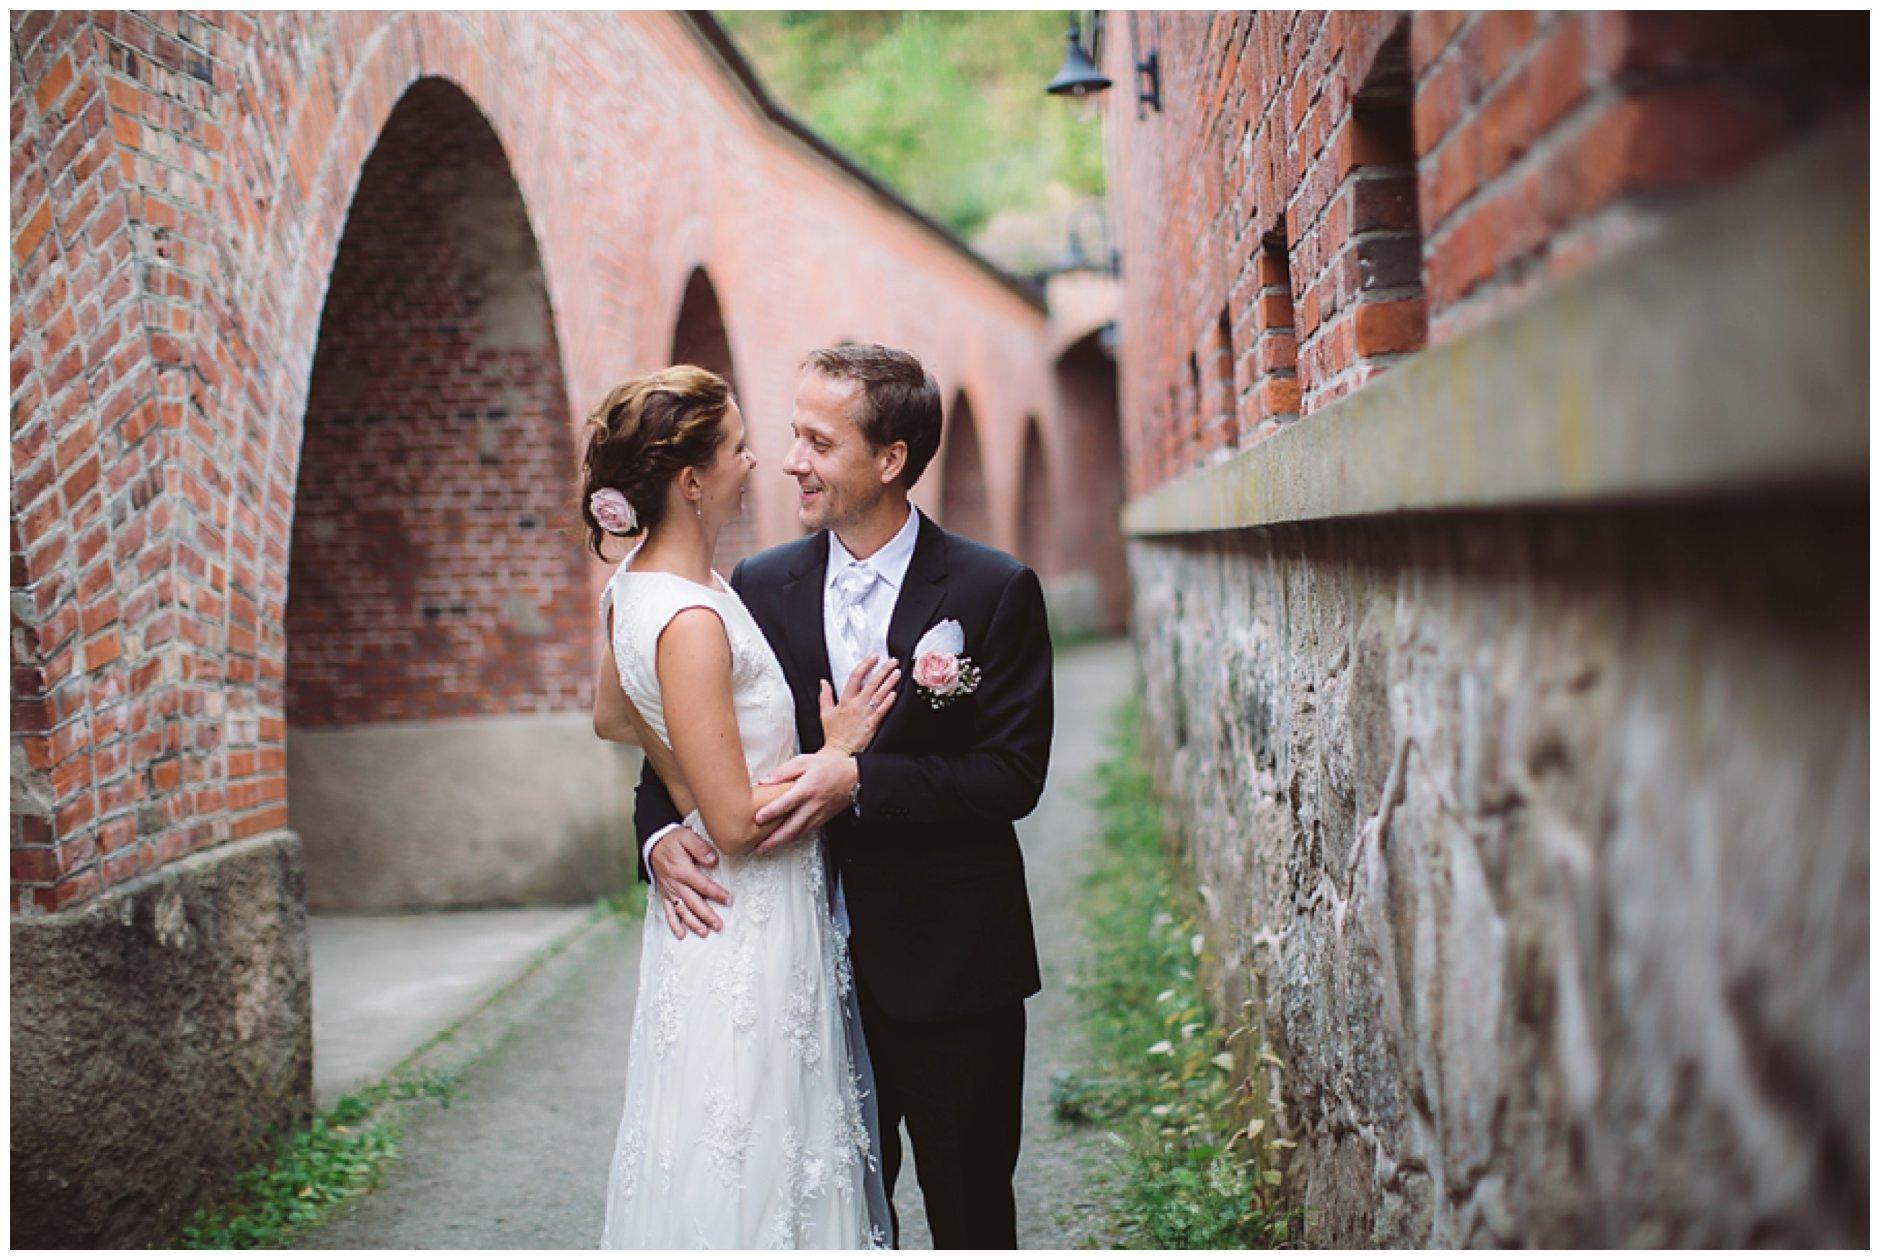 Bryllup Drøbak kirke Reenskaug og Oscarsborg heldagsfotografering